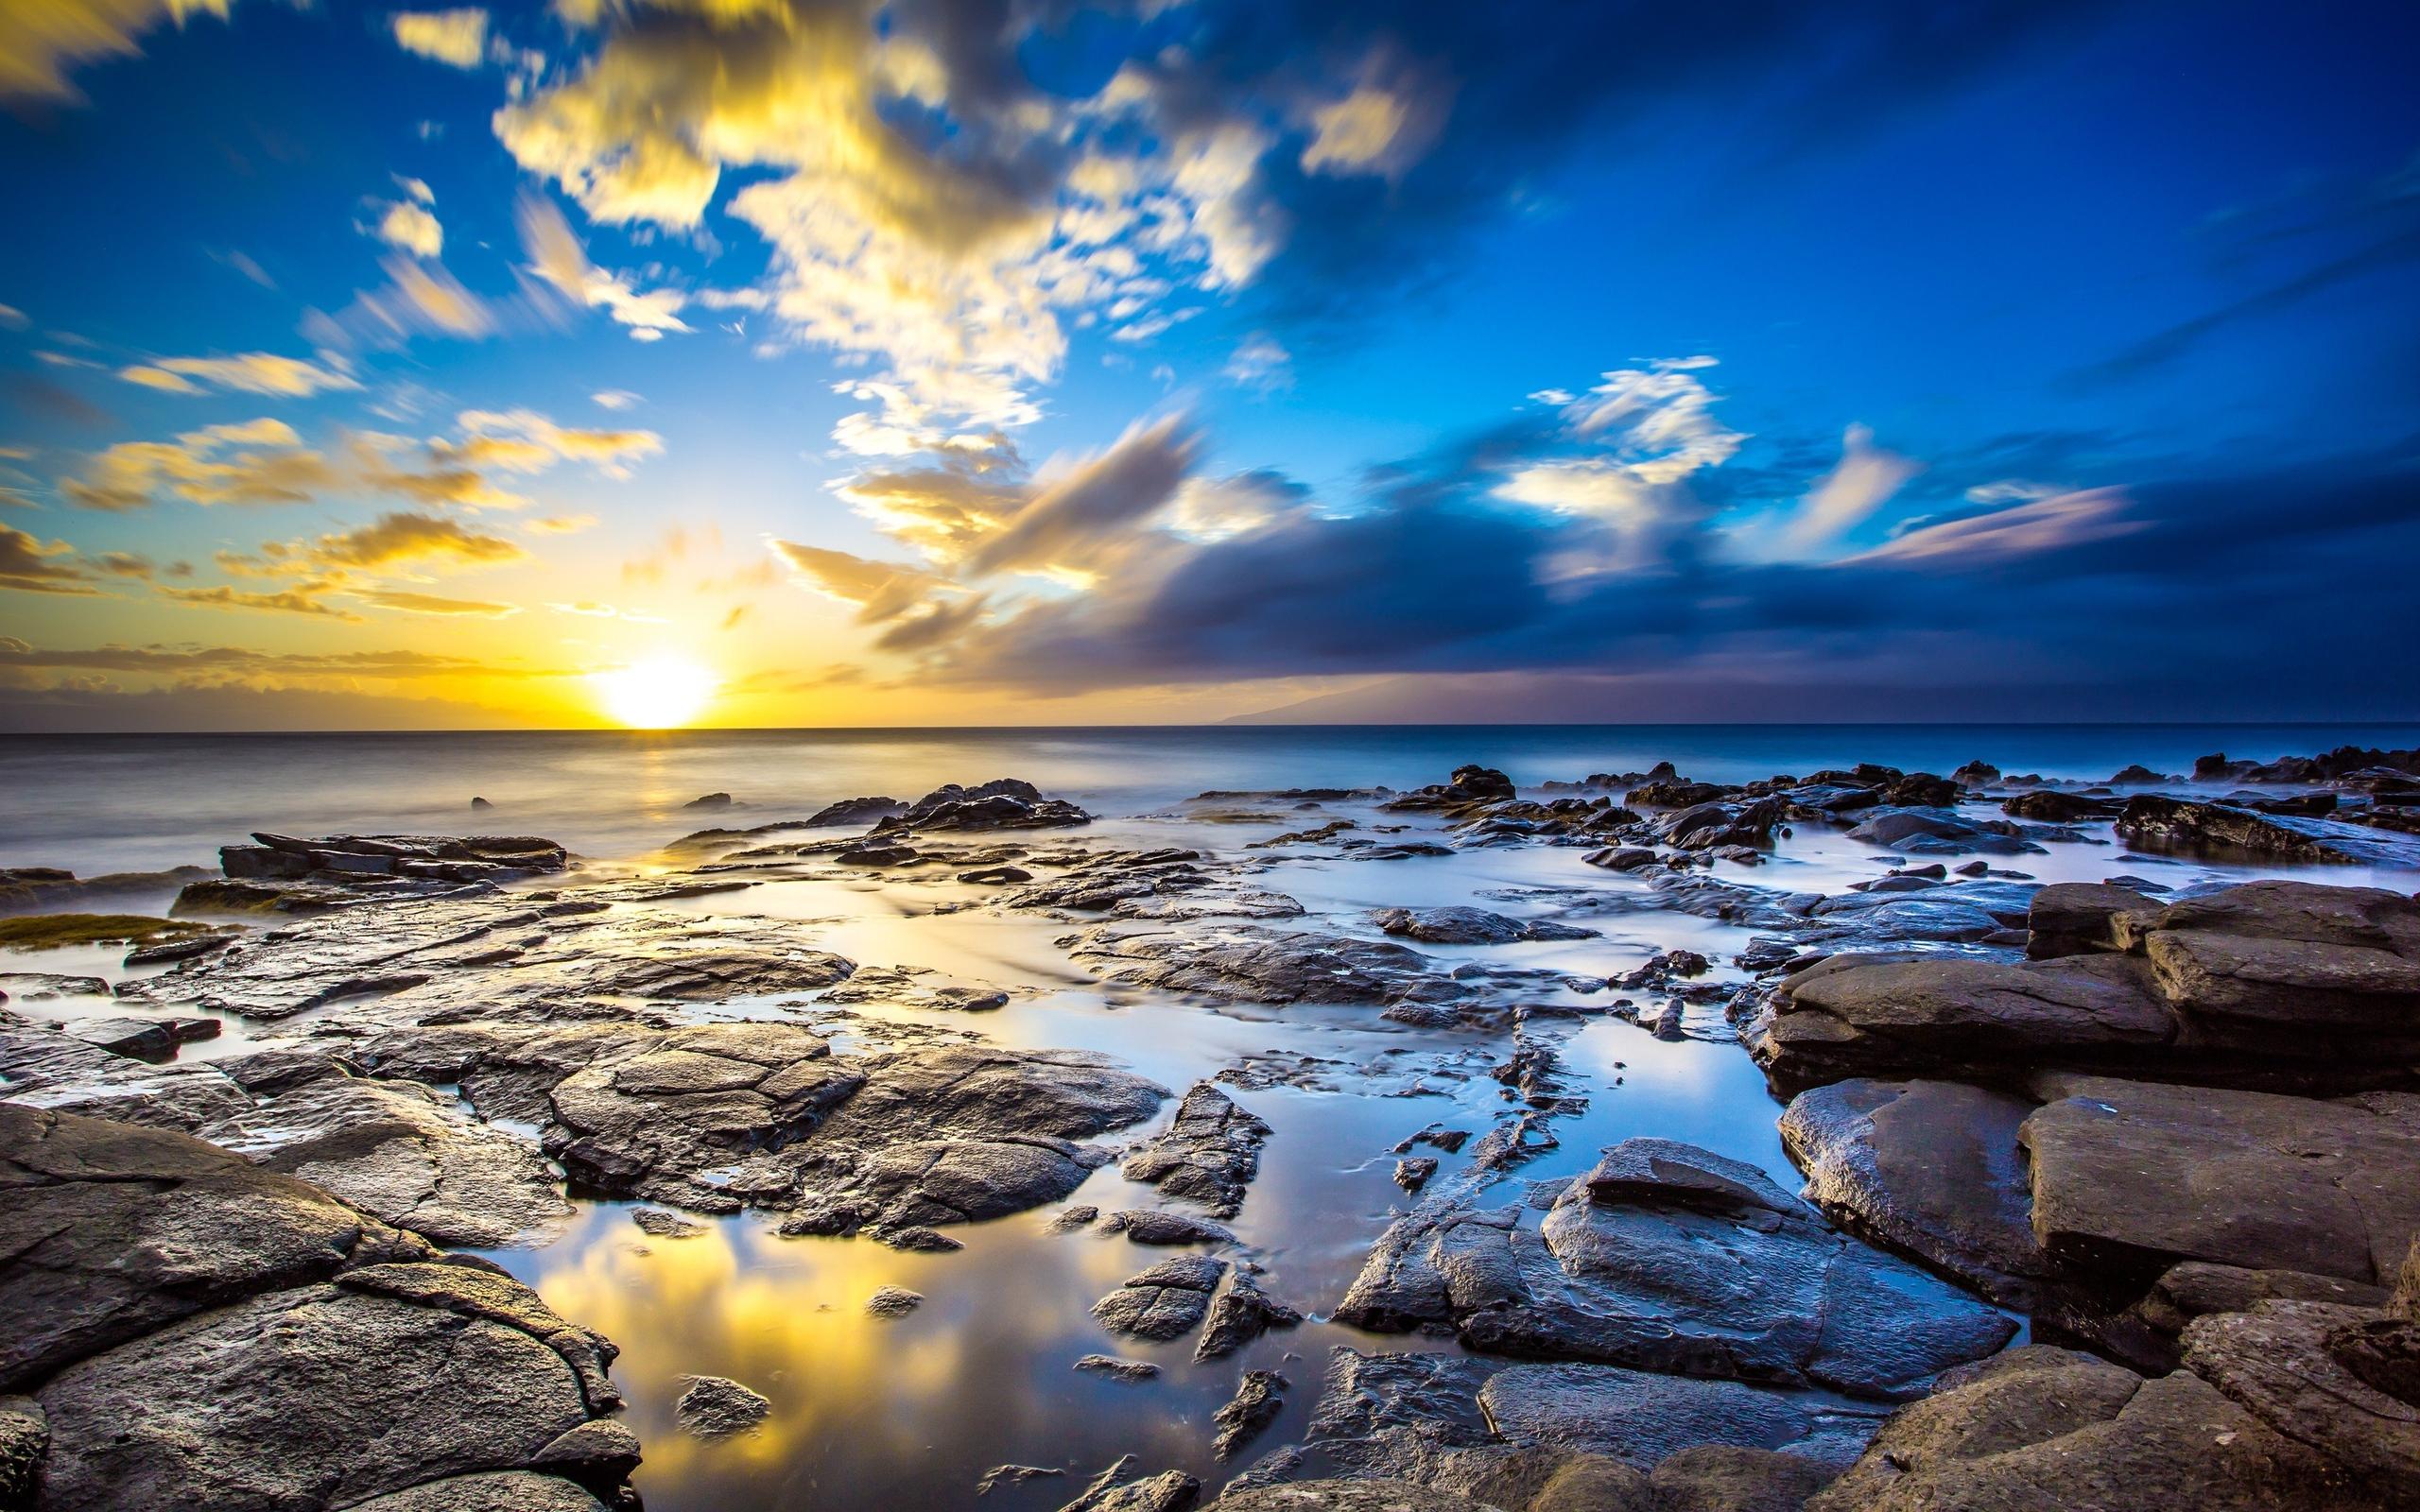 Sunrise Ocean 4K Ultra HD wallpaper 4k WallpaperNet 2560x1600